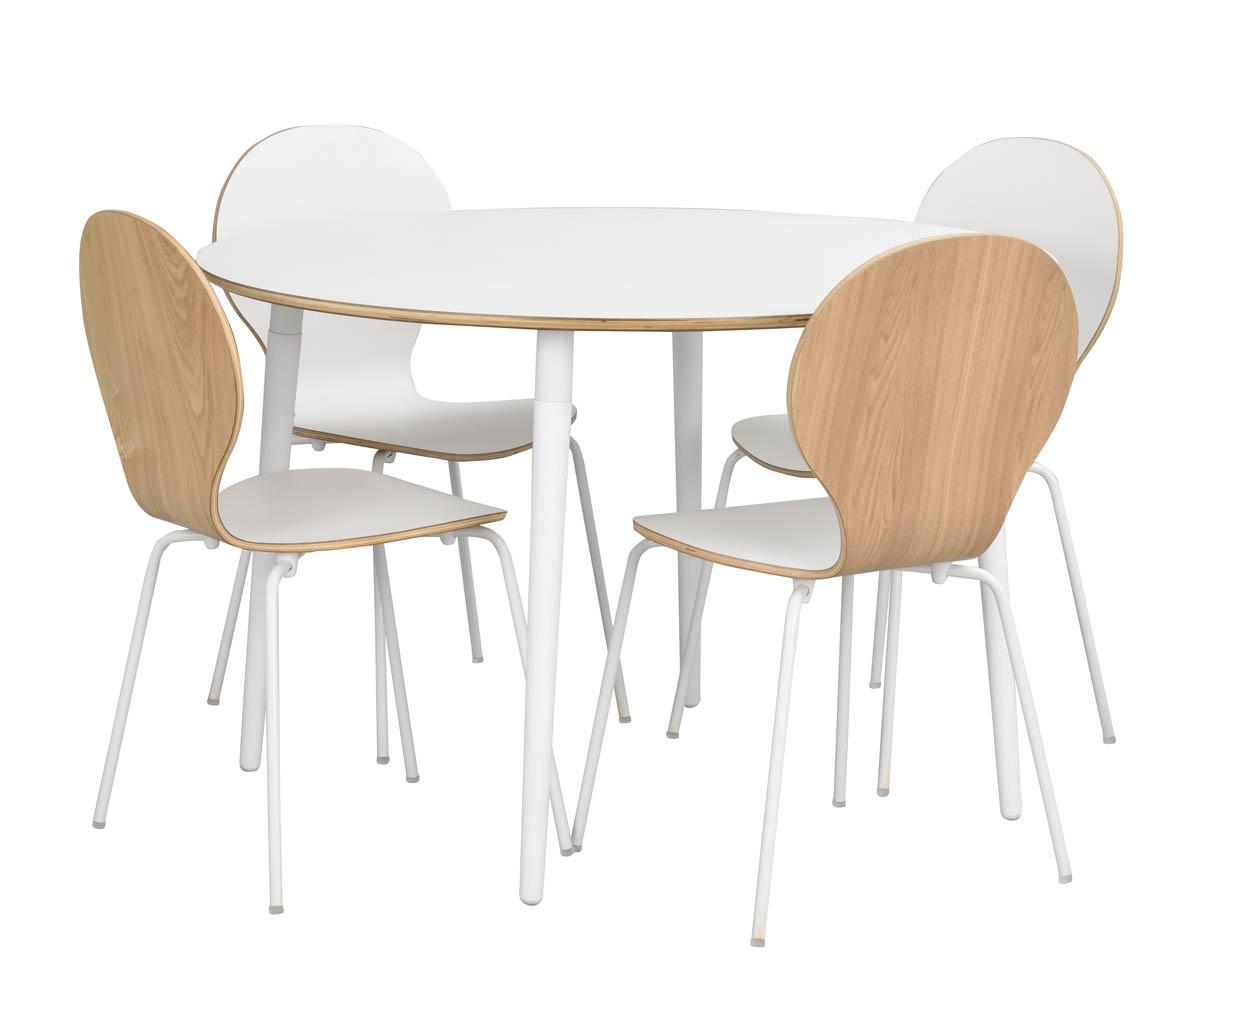 Rowico Fusione Ronde Eettafel 115 Cm- Wit HPL Tafelblad - Witte Poten